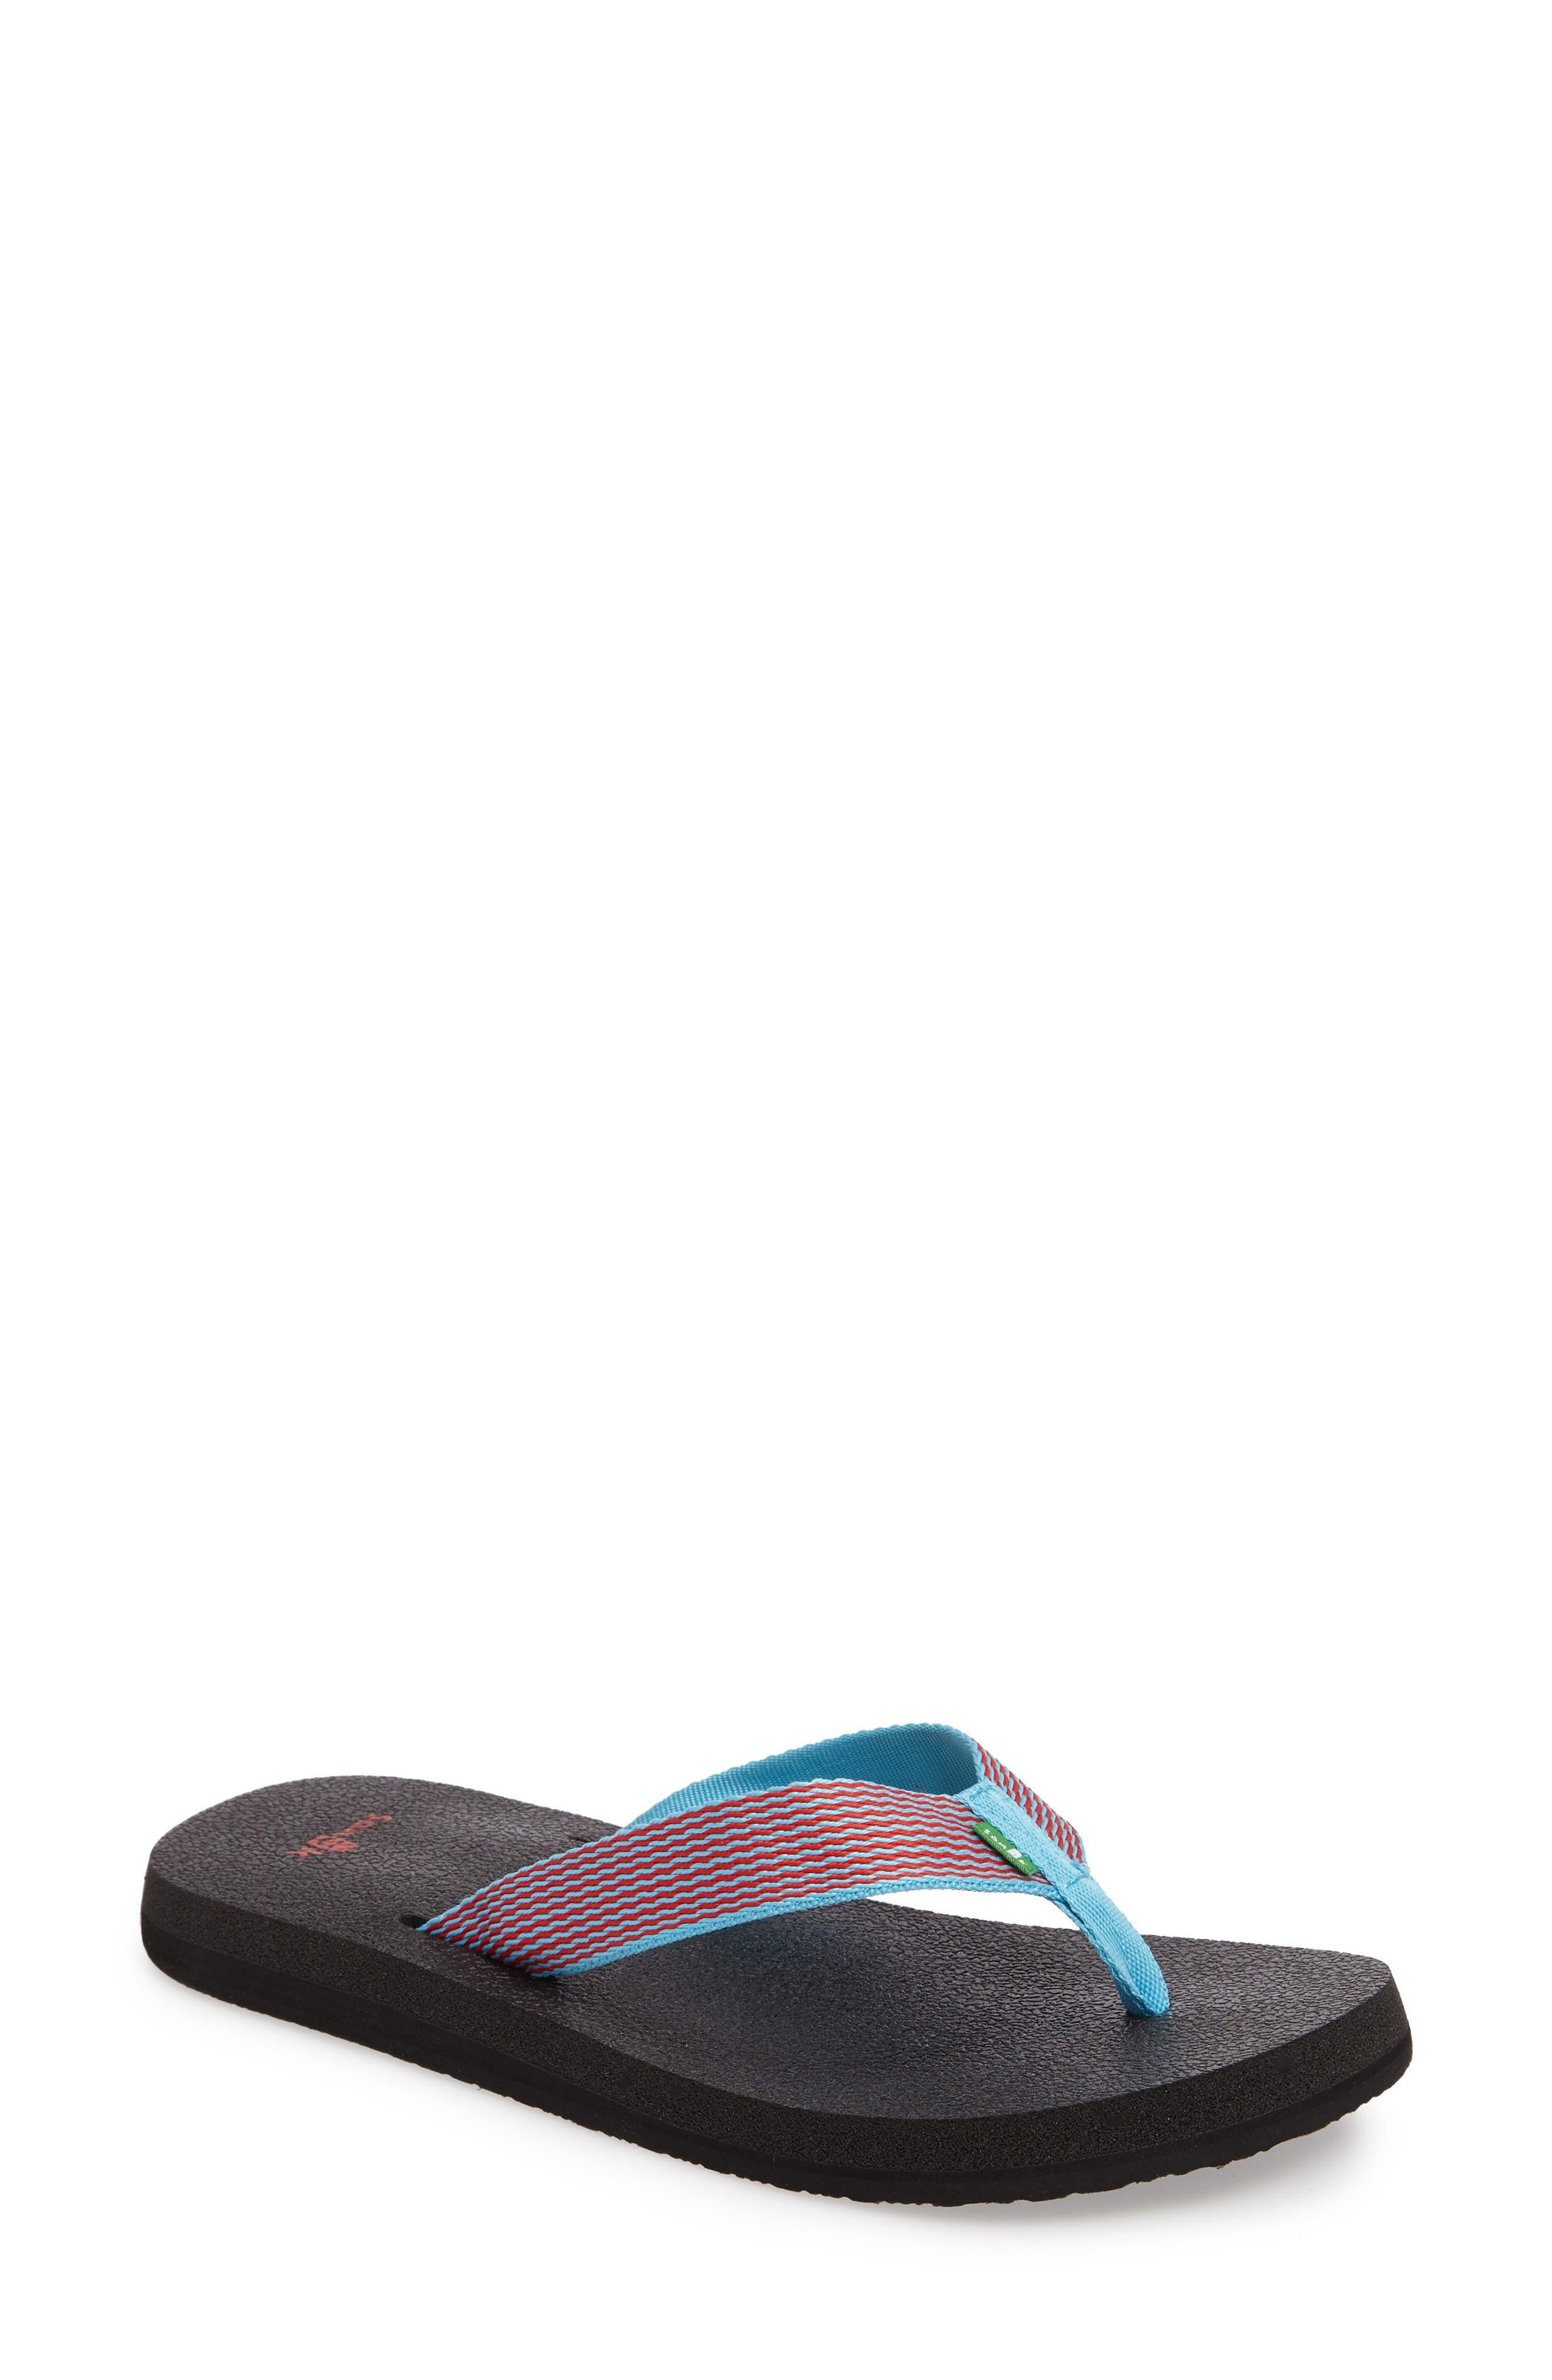 yoga espadrille shoes casual mat bernini giani flip flop sandals sanuk mats colbey toe womens pin open